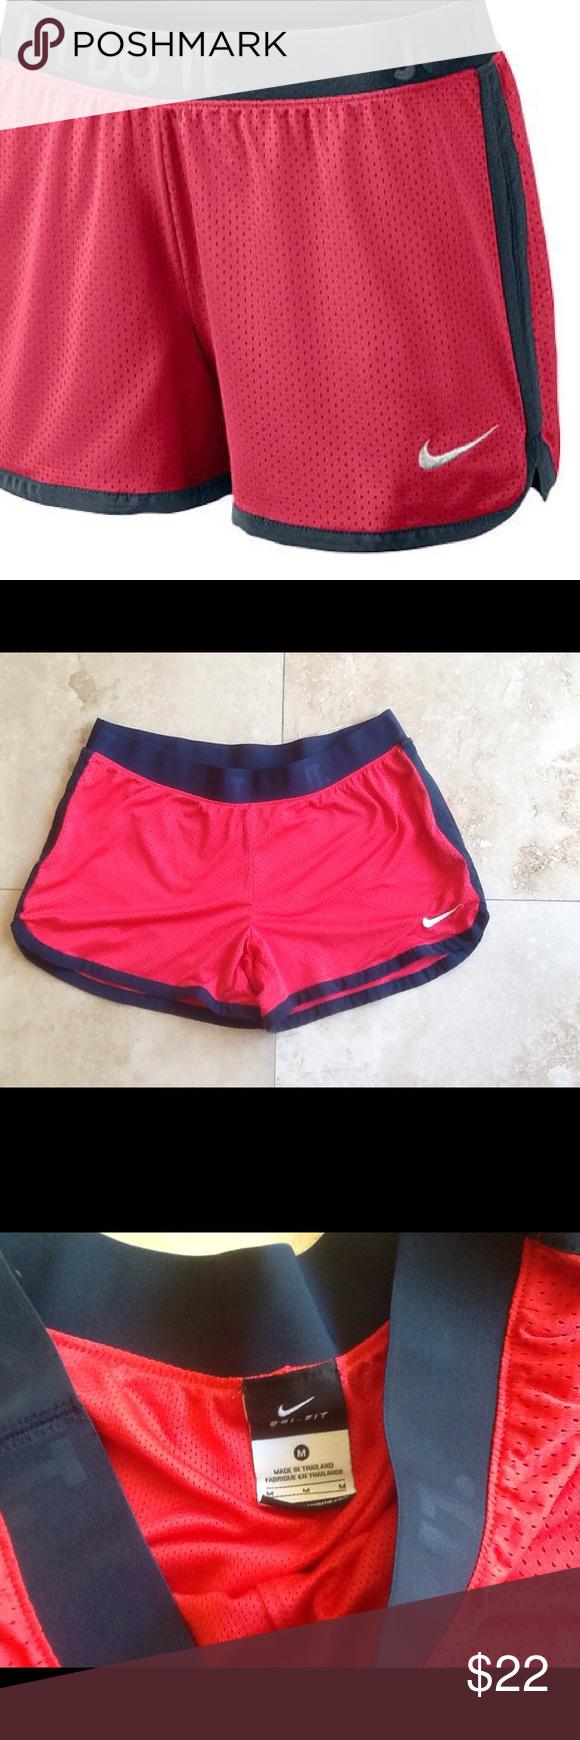 Nike Icon Mesh Shorts NWOT NWOT Nike Icon Mesh shorts. JUST DO IT on waist band.Dri- Fit material. Nike Shorts